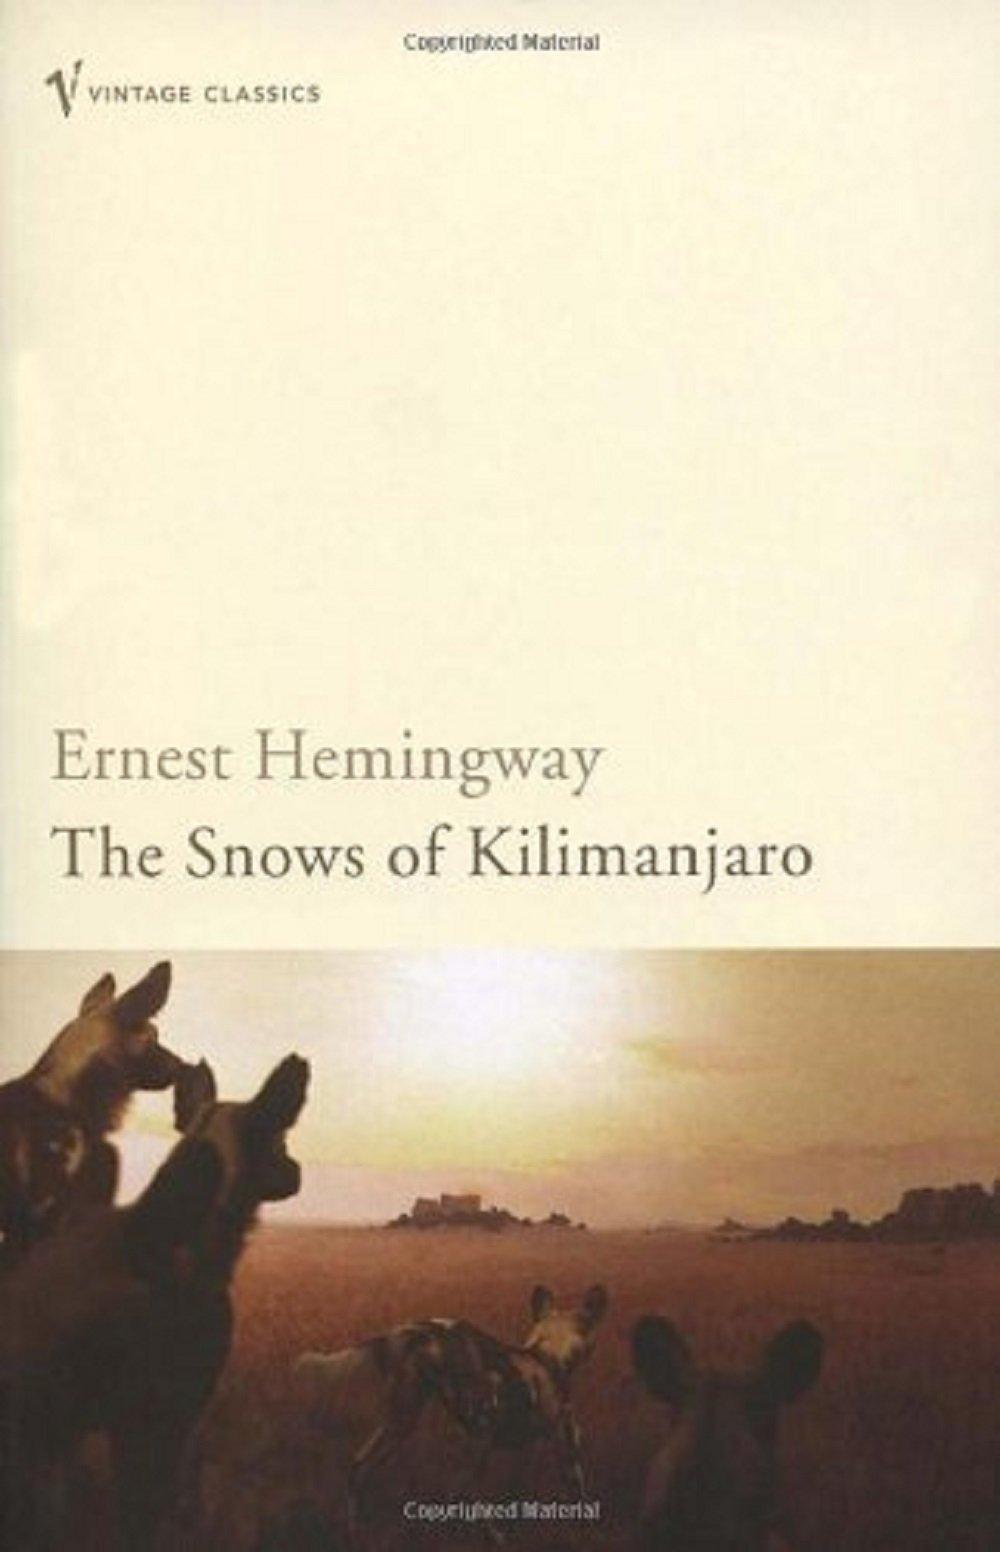 the snows of kilimanjaro online